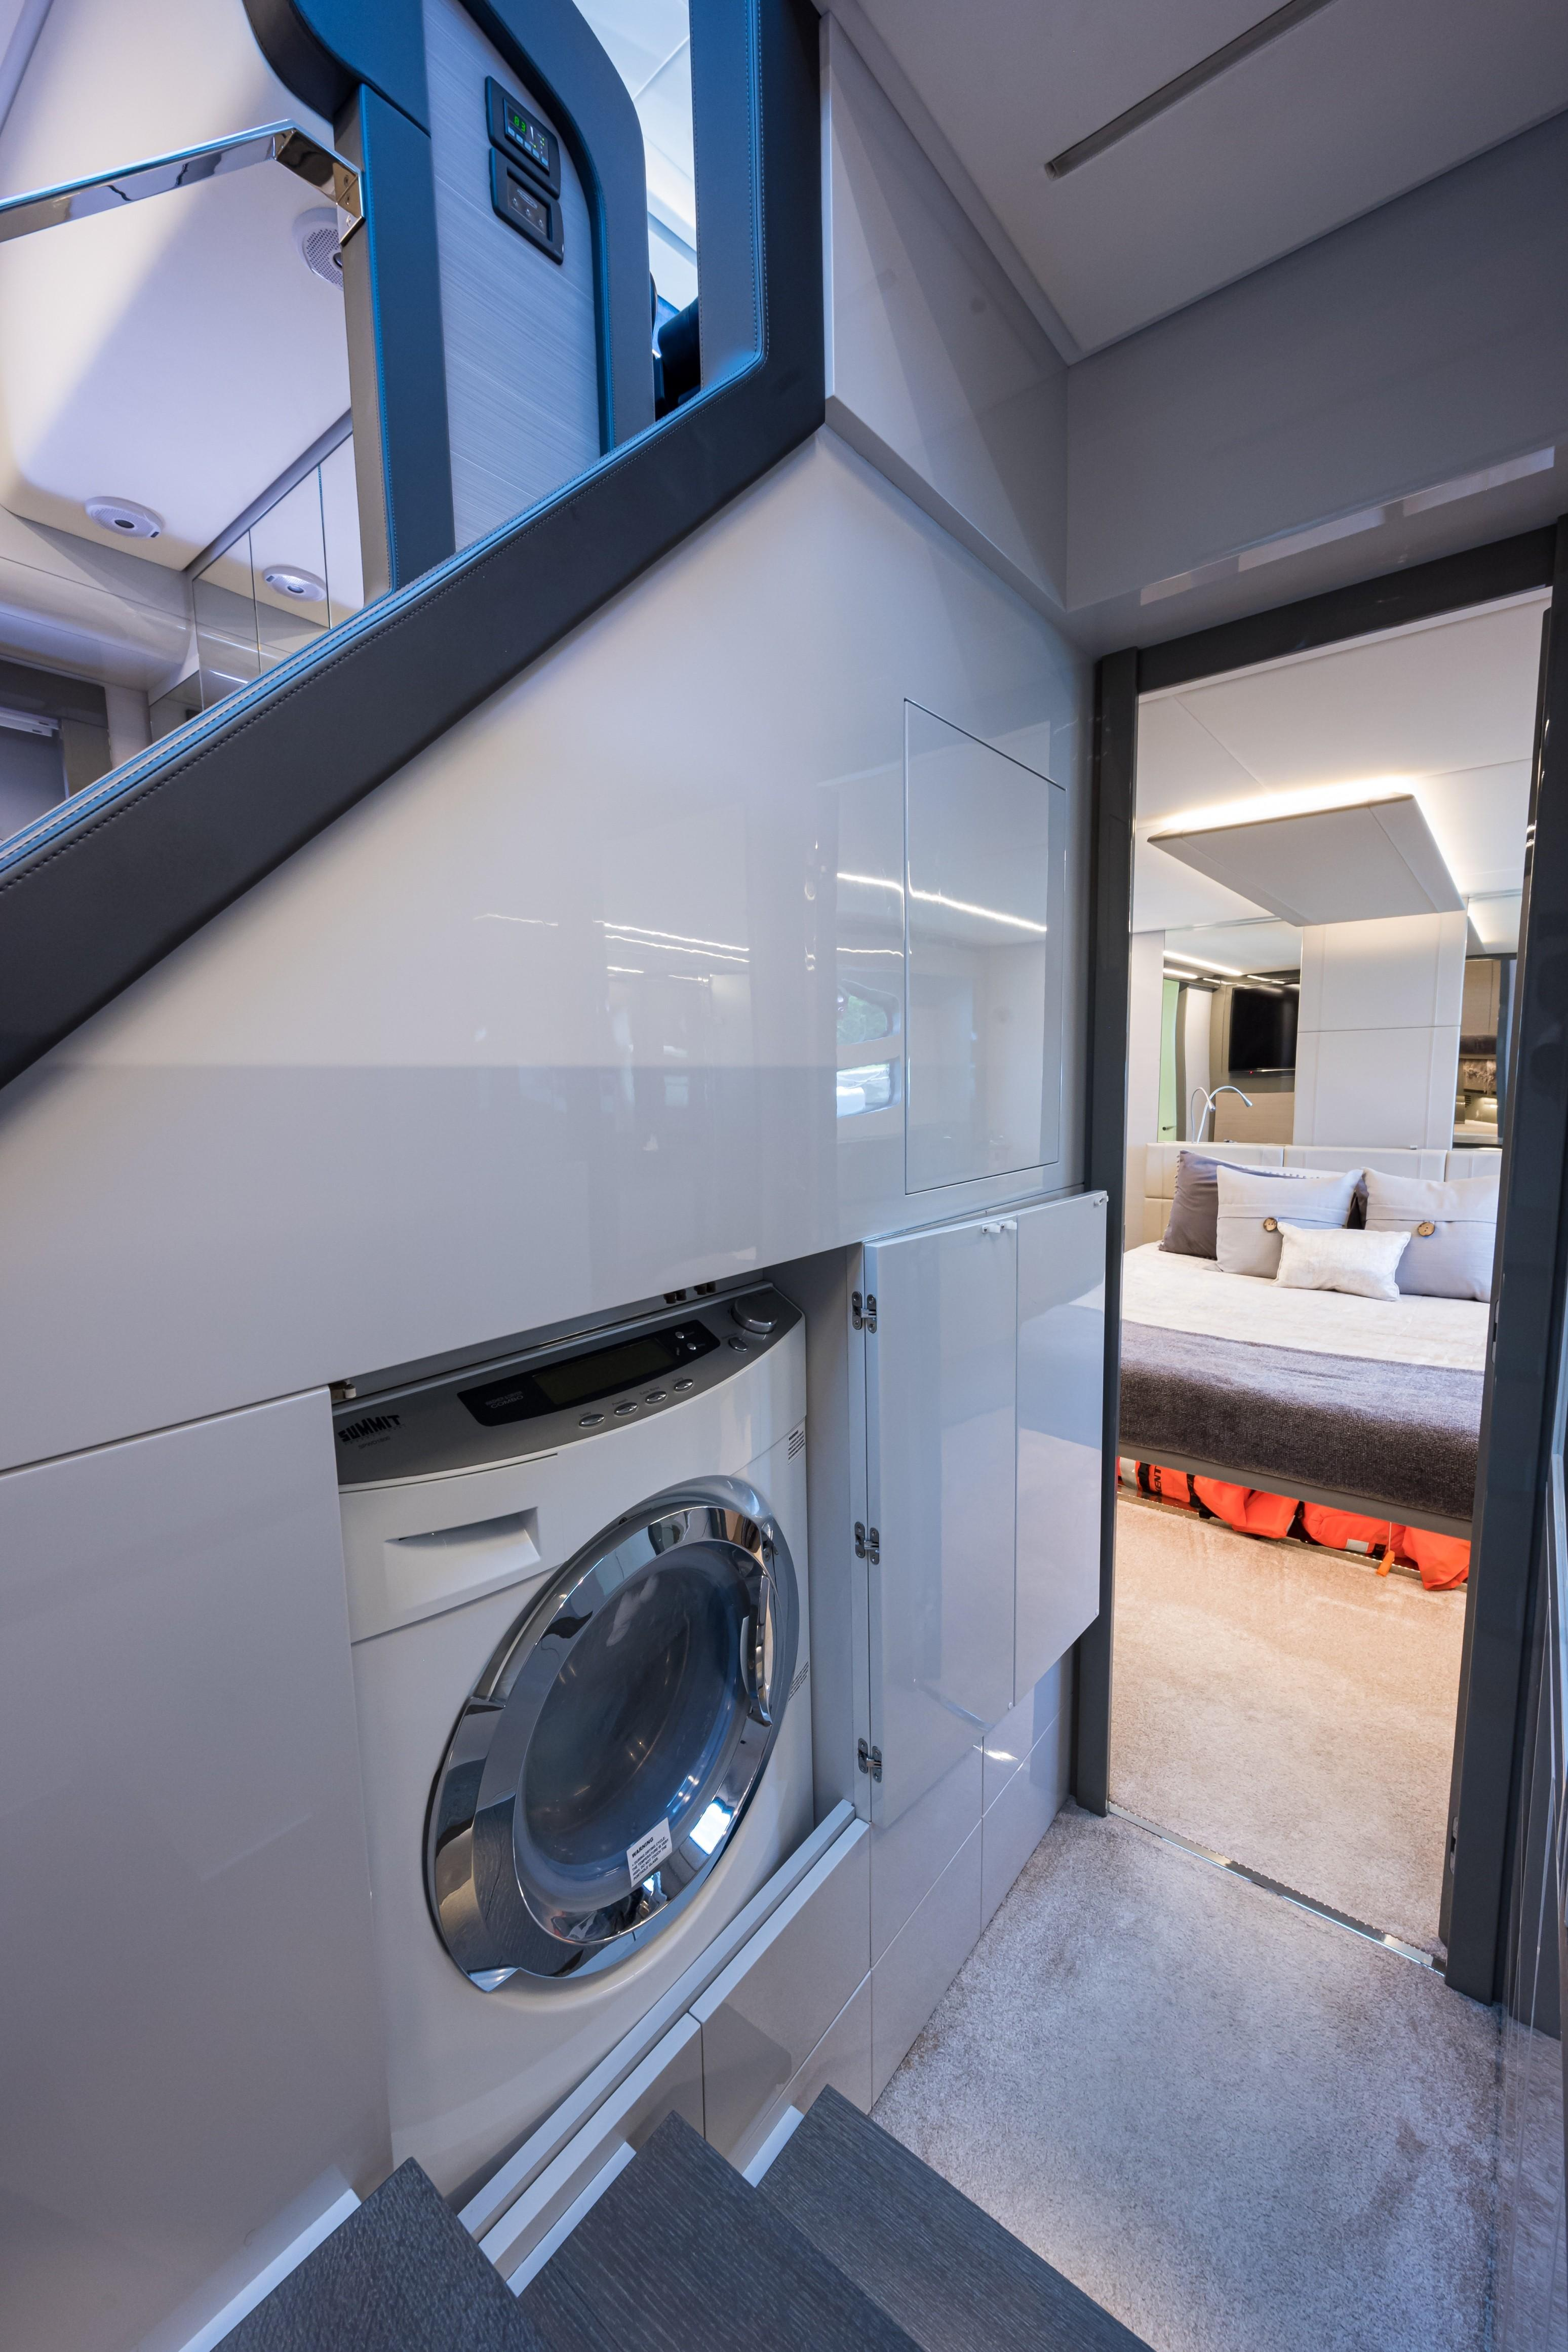 2016 Pershing 62 - Laundry